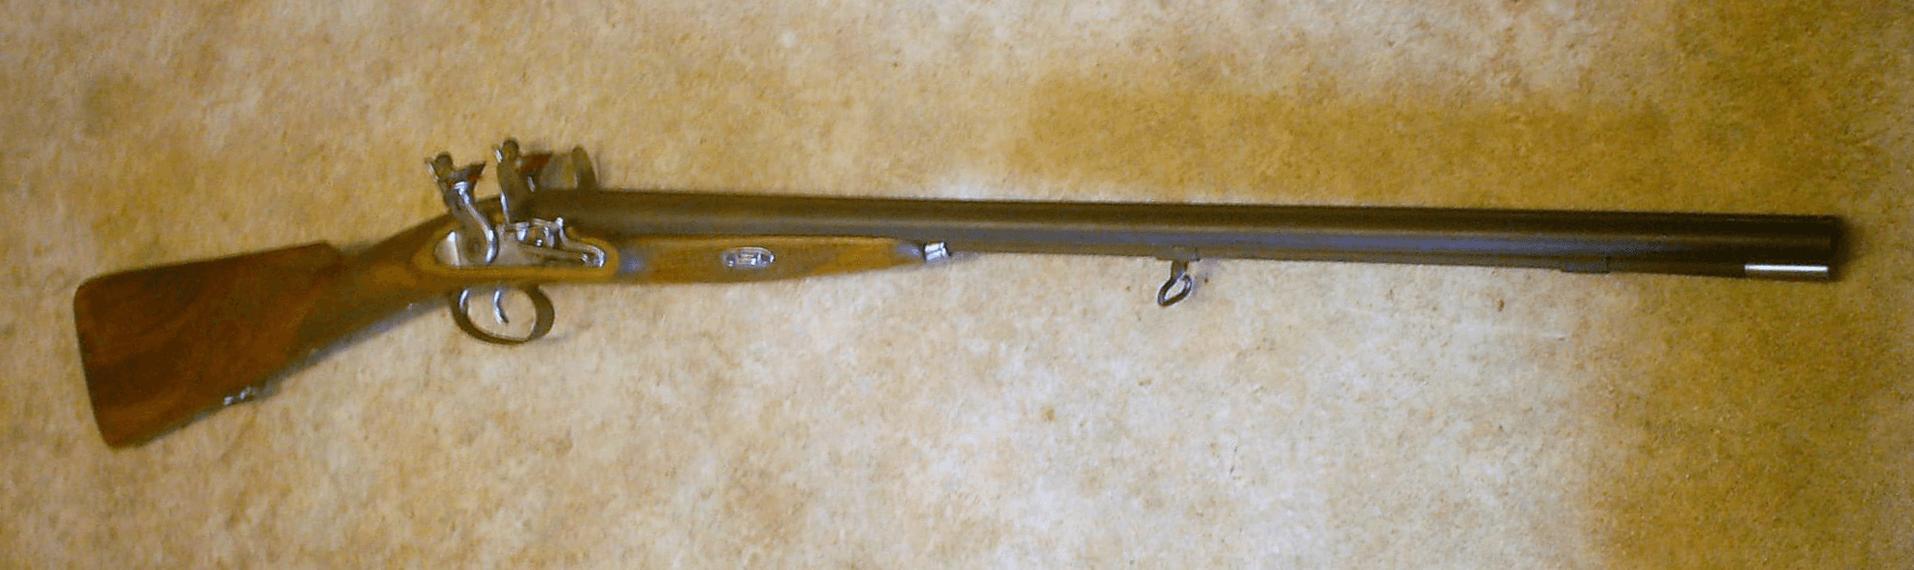 Double Barrelled Shotgun (Flintlock)